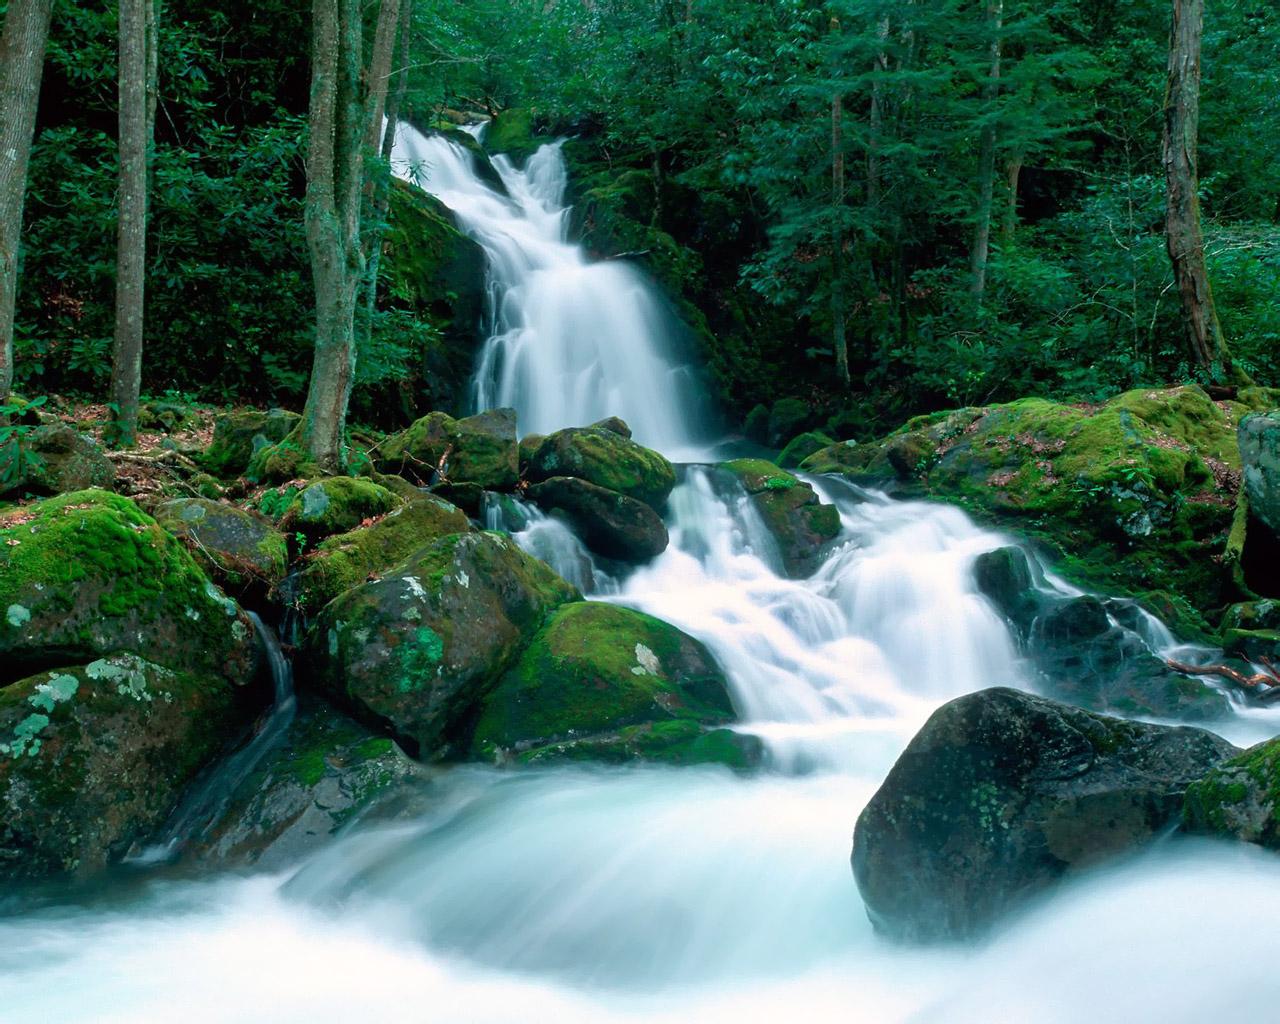 World Landscape Wallpapers 1280*1024 No - High Resolution Smoky Mountains - HD Wallpaper